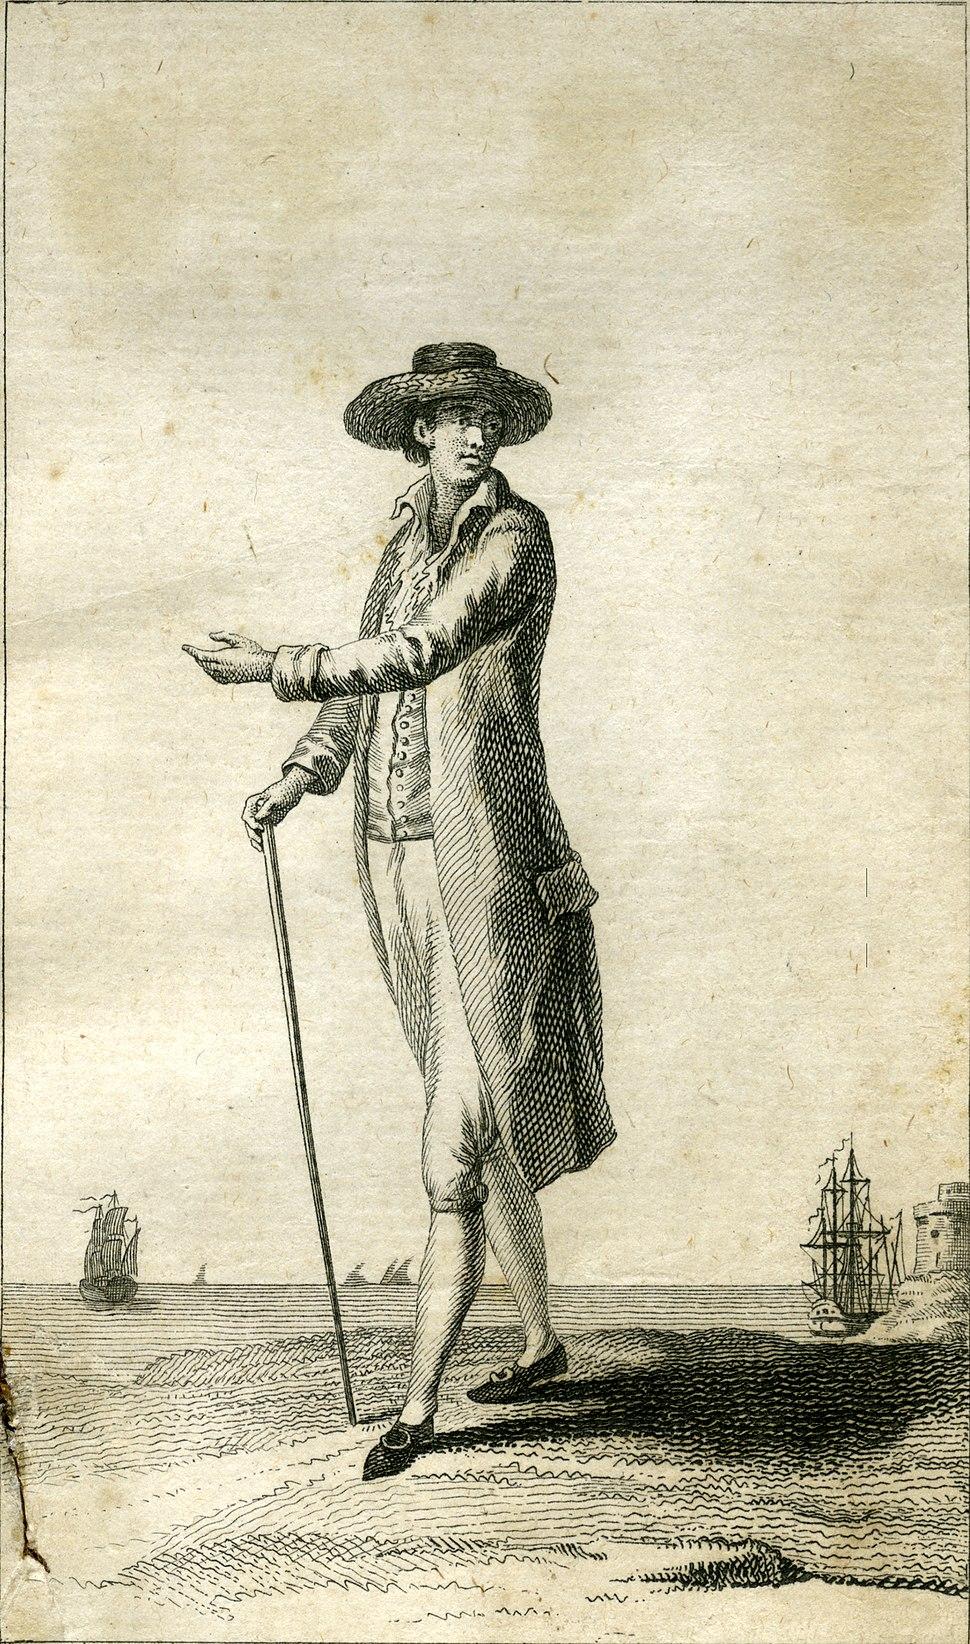 Criollo of Cartagena de Indias (Colombia) circa 1796